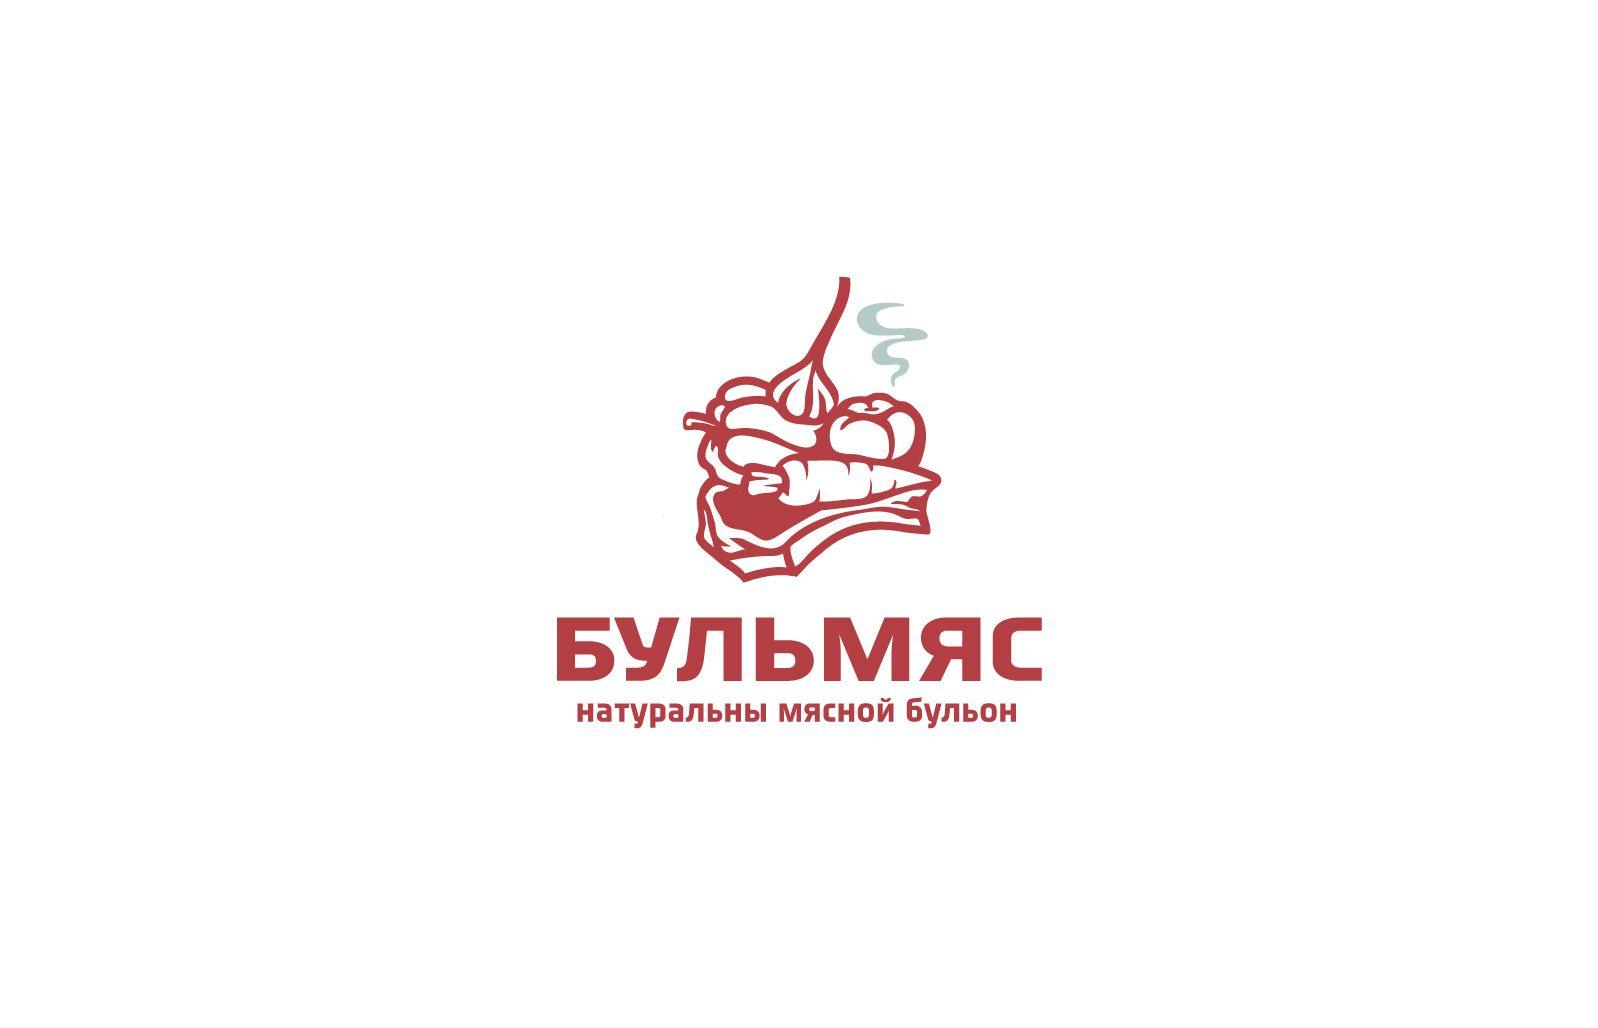 Логотип для БУЛЬМЯС - дизайнер andblin61